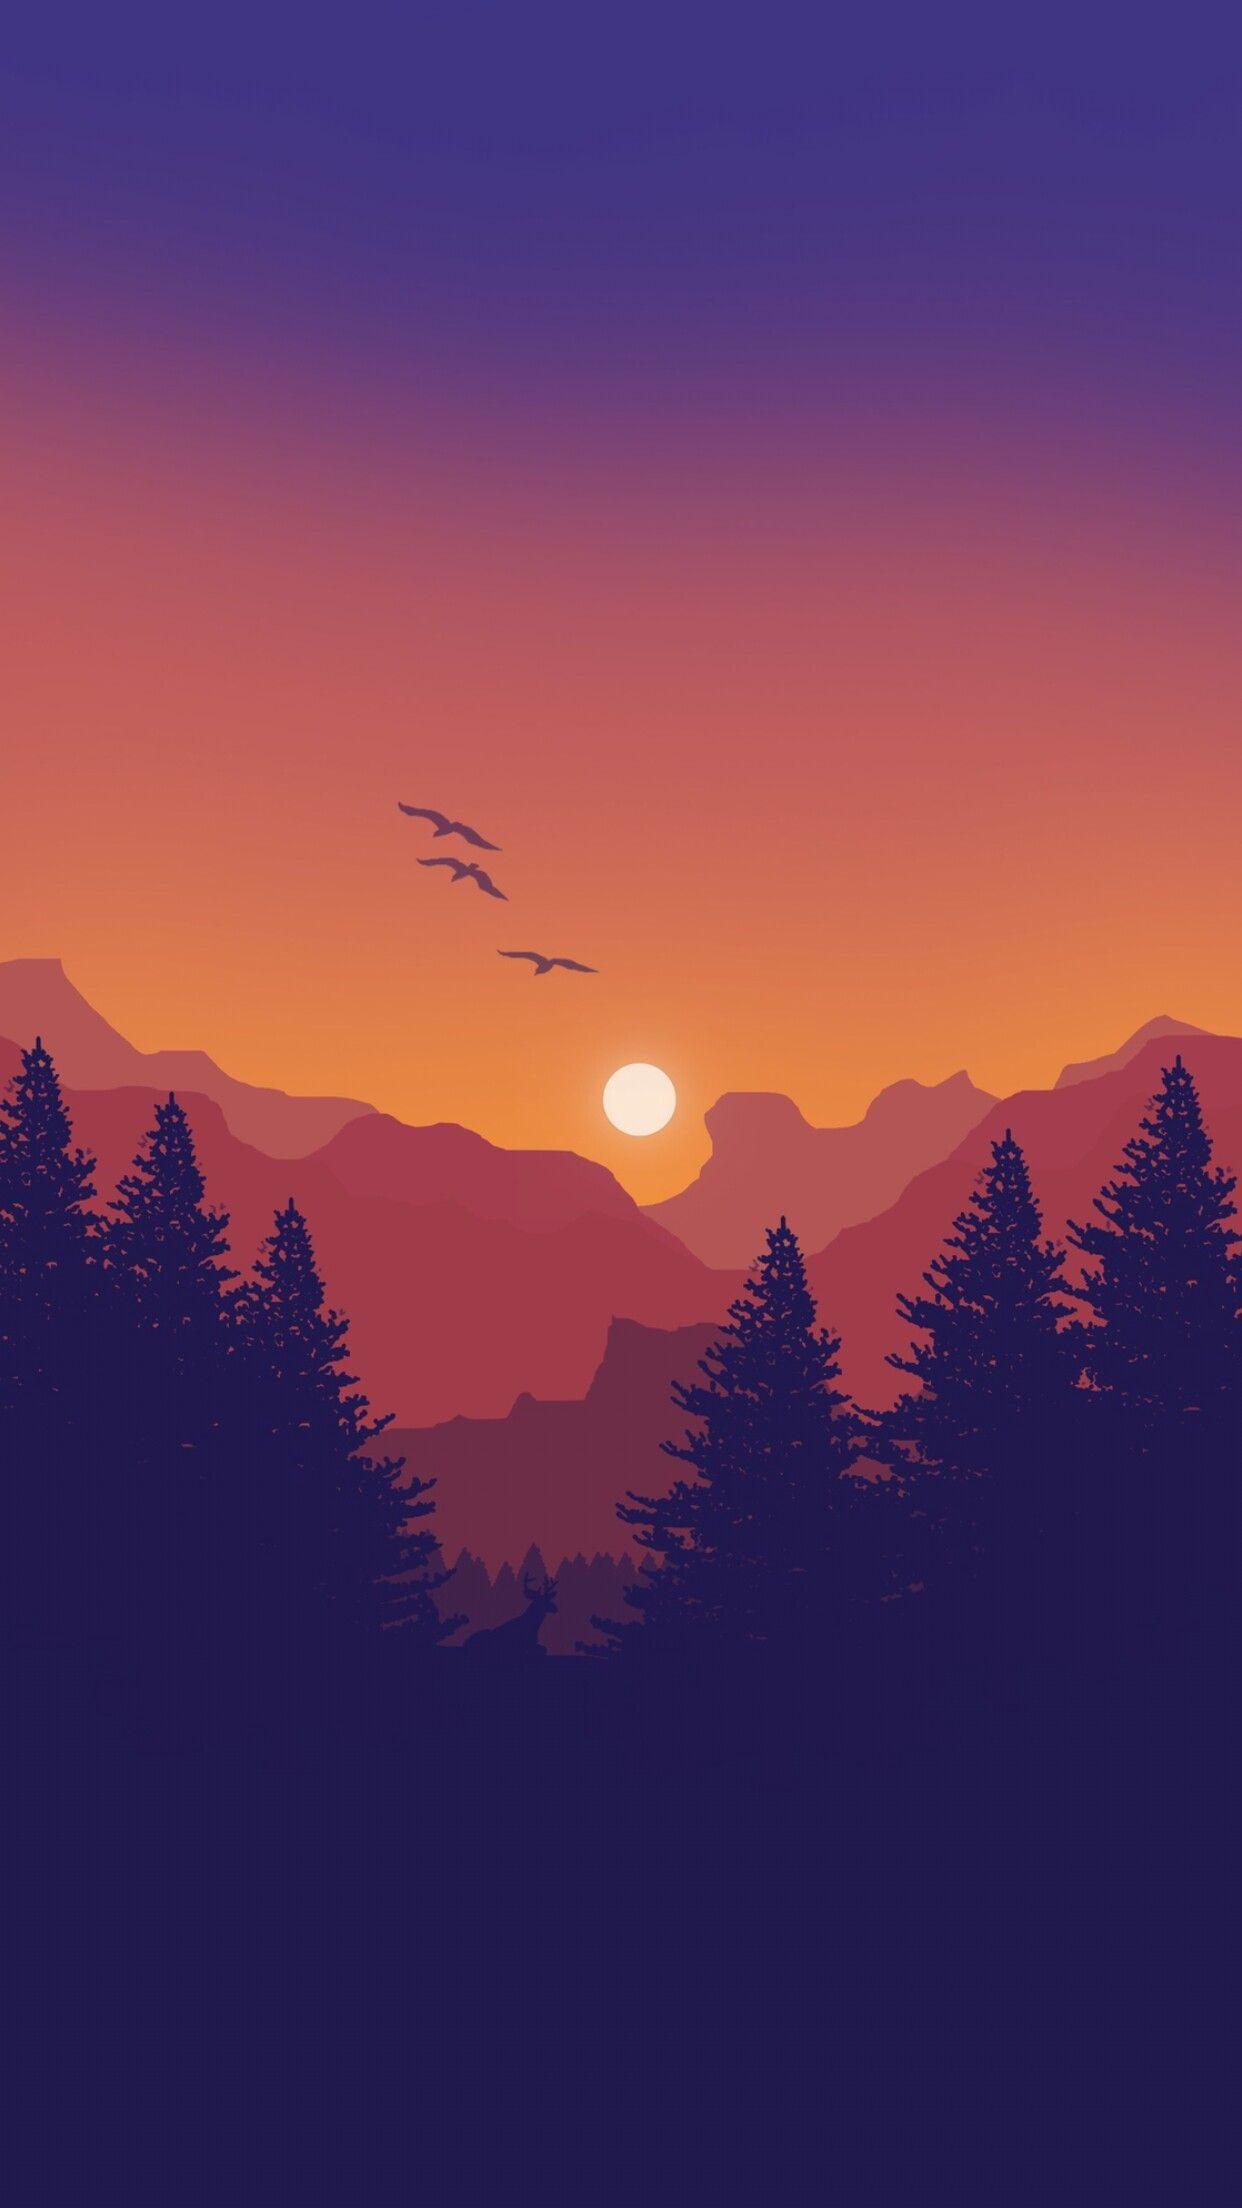 Inspo For Flat Style Graphics Pemandangan Khayalan Pemandangan Latar Belakang